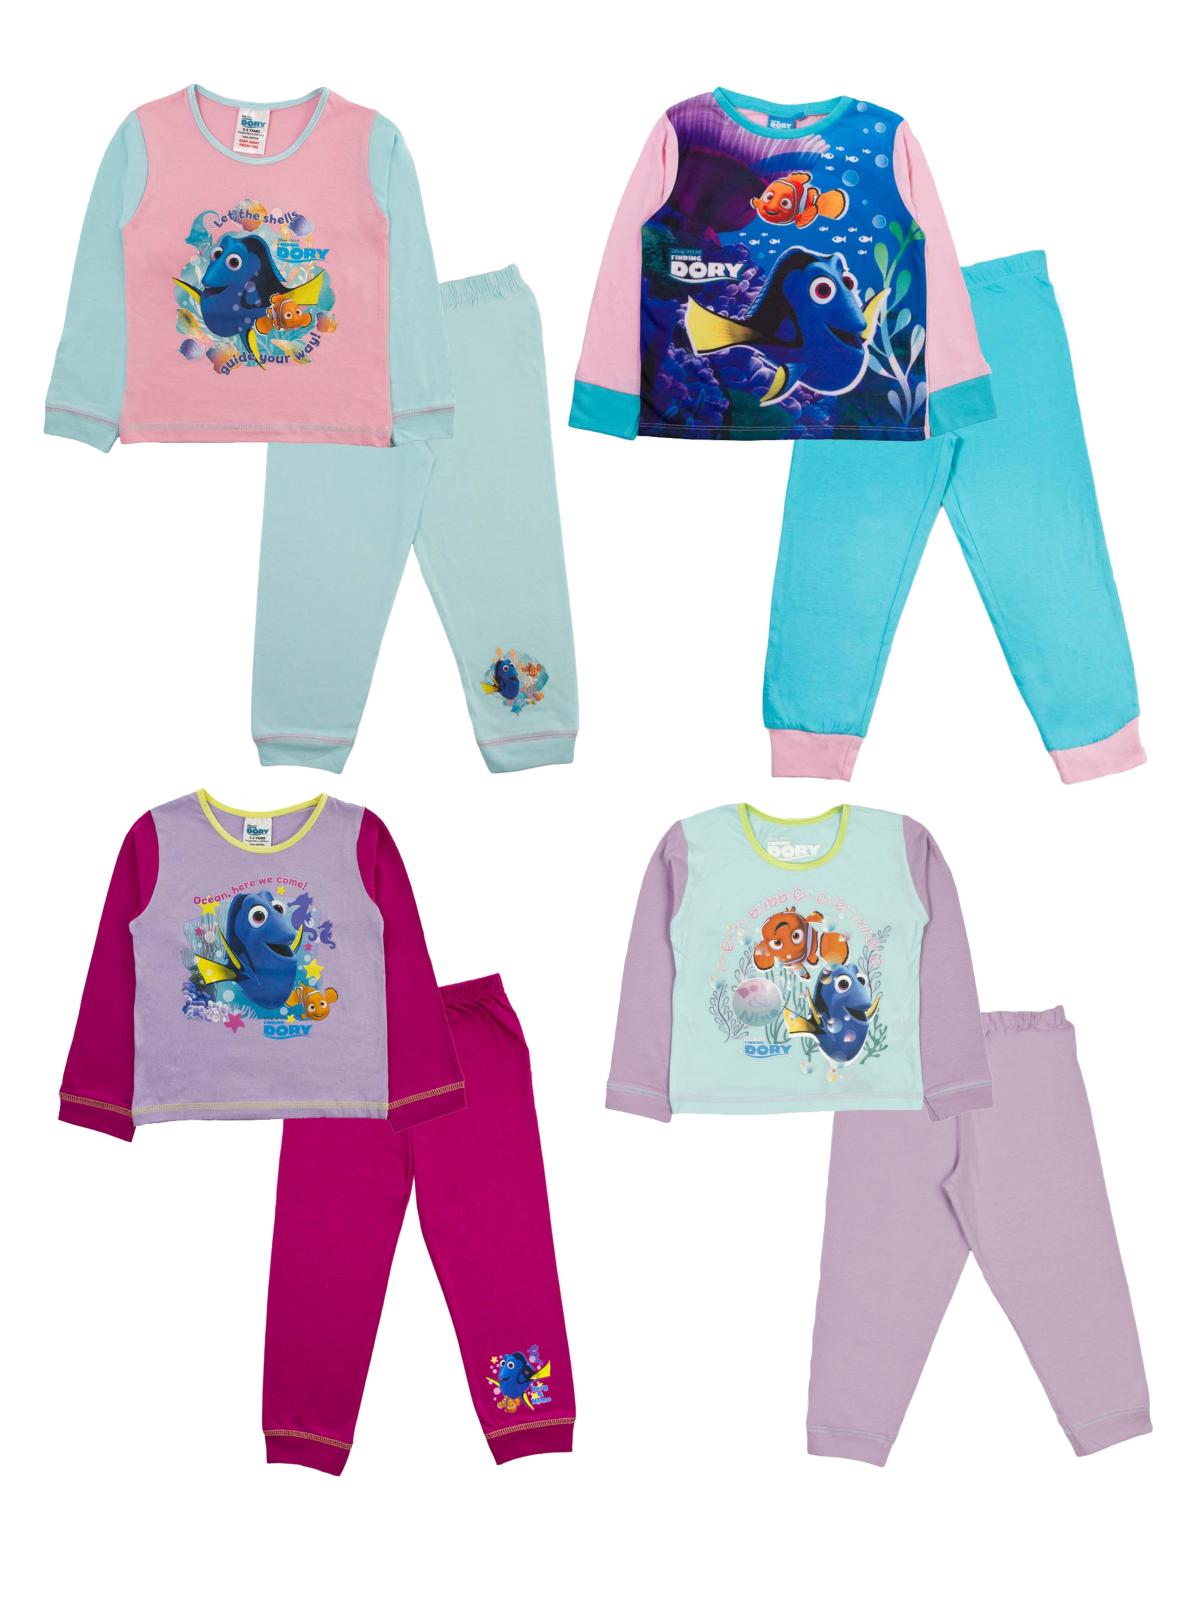 New Disney Finding Dory Girls Pyjamas Nightwear Nemo Pink 18 months to 5 years